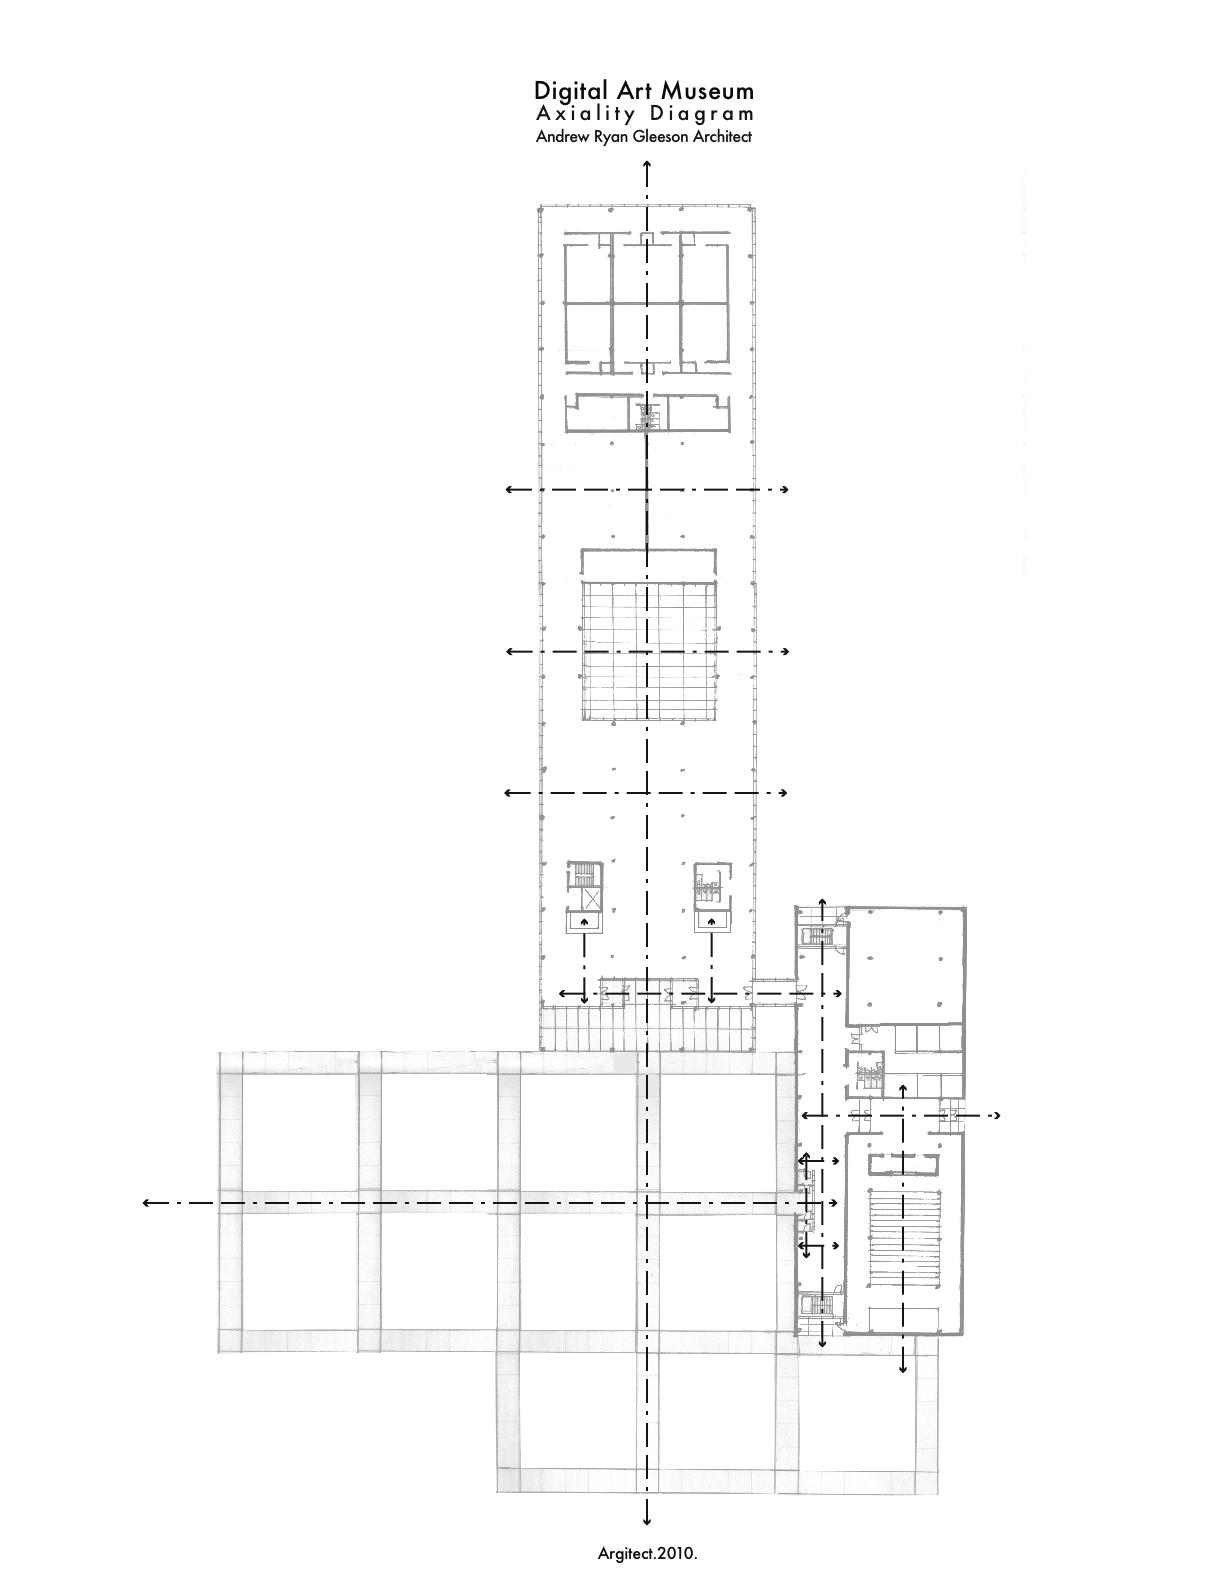 5 axis diagram